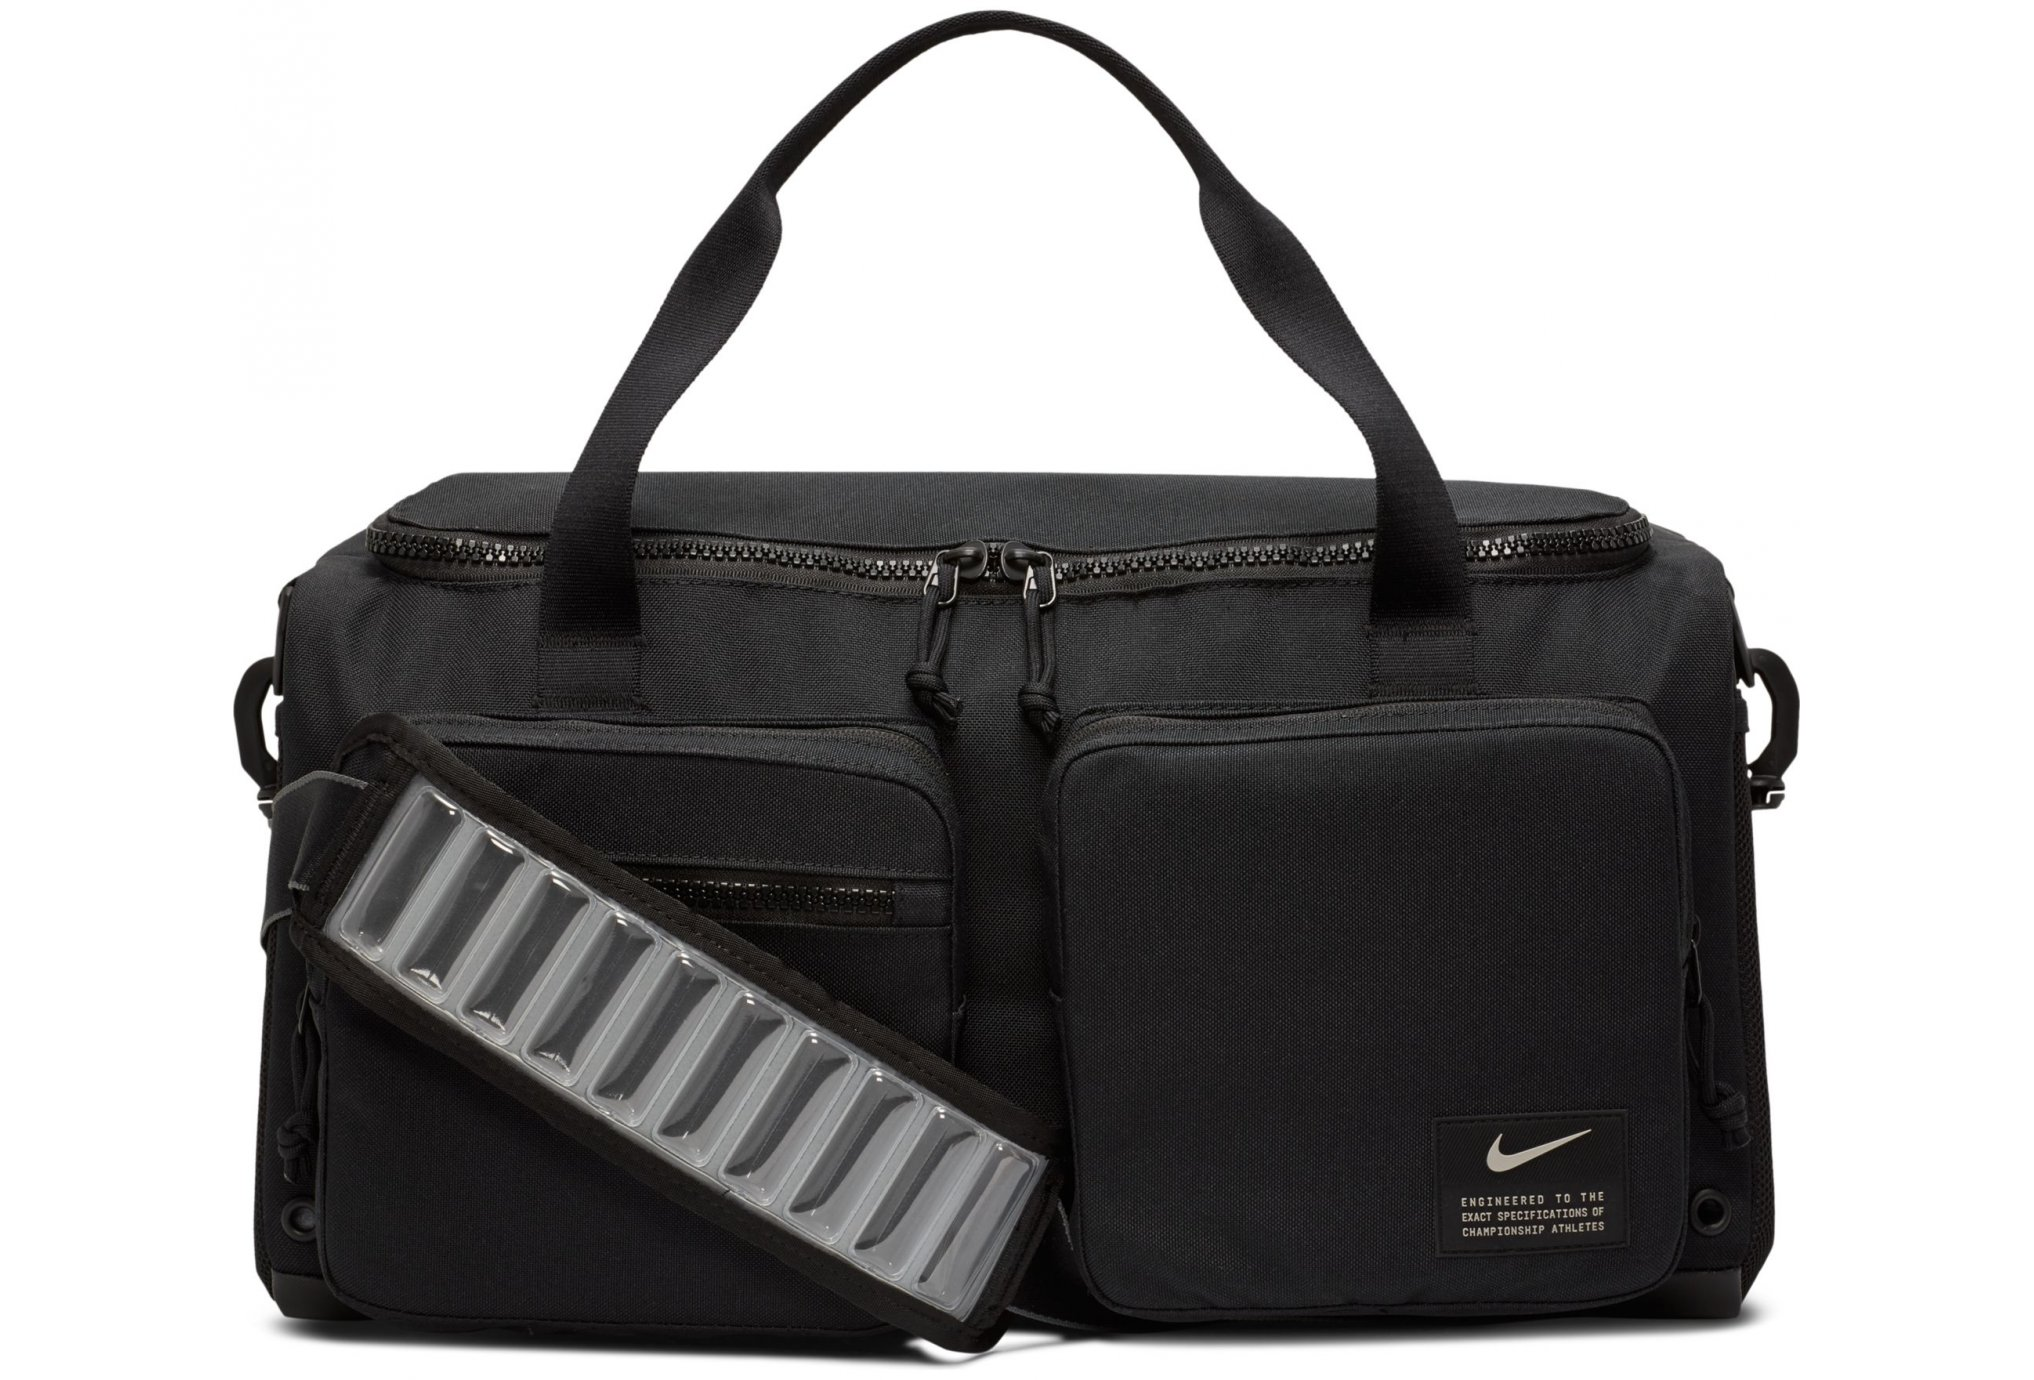 Nike Utility Power Duffel - S Sac de sport